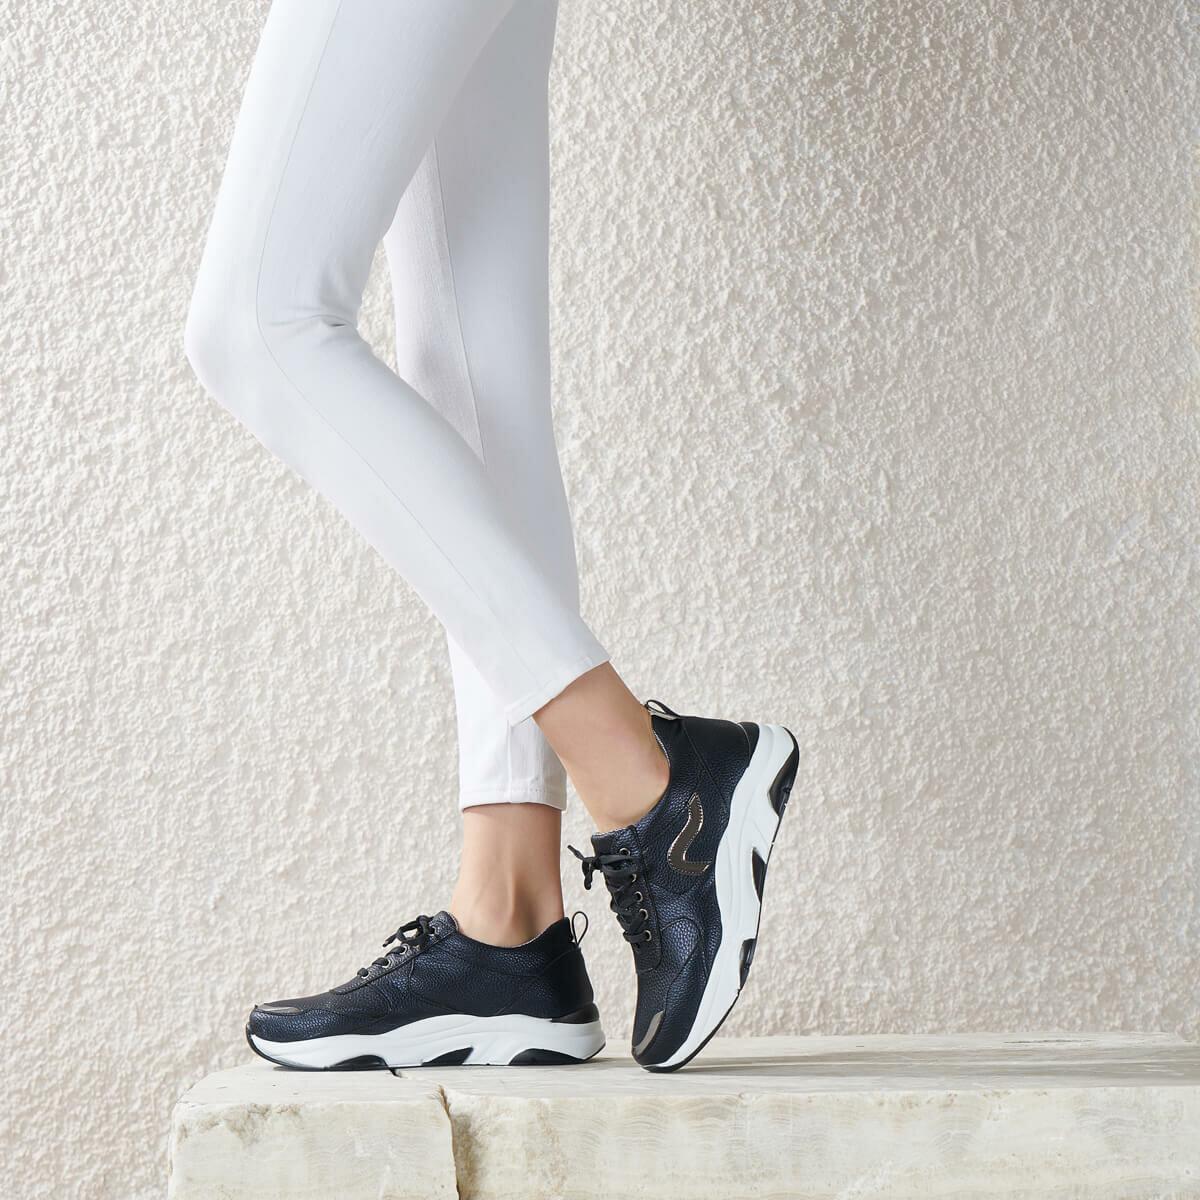 FLO ALIN85Z SKIN Black Women Shoes BUTIGO